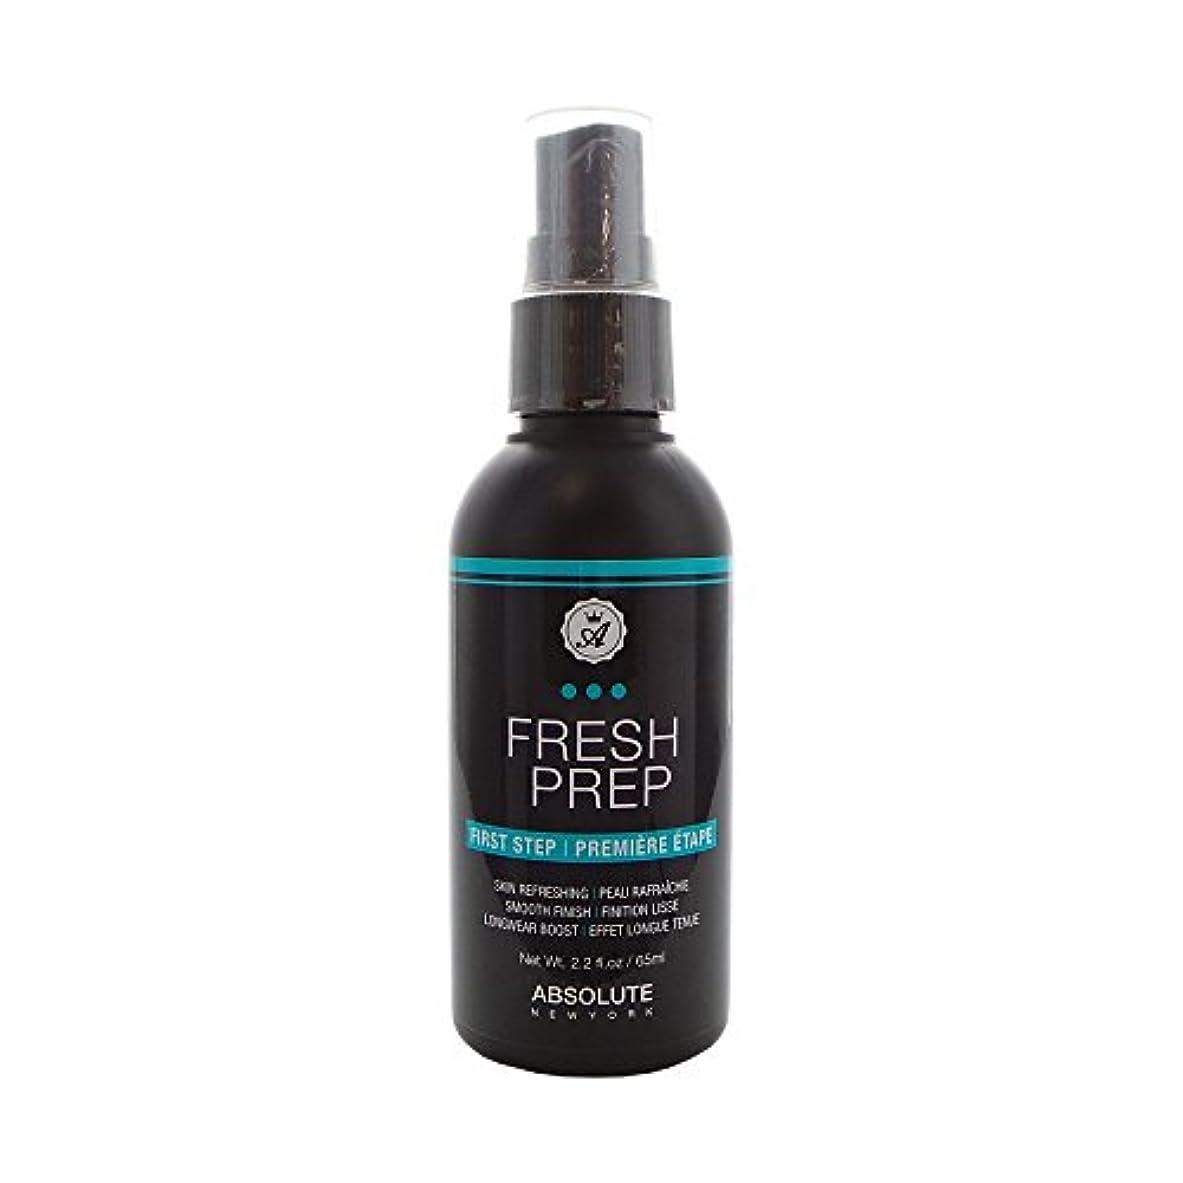 (6 Pack) ABSOLUTE Fresh Prep Primer Spray (並行輸入品)